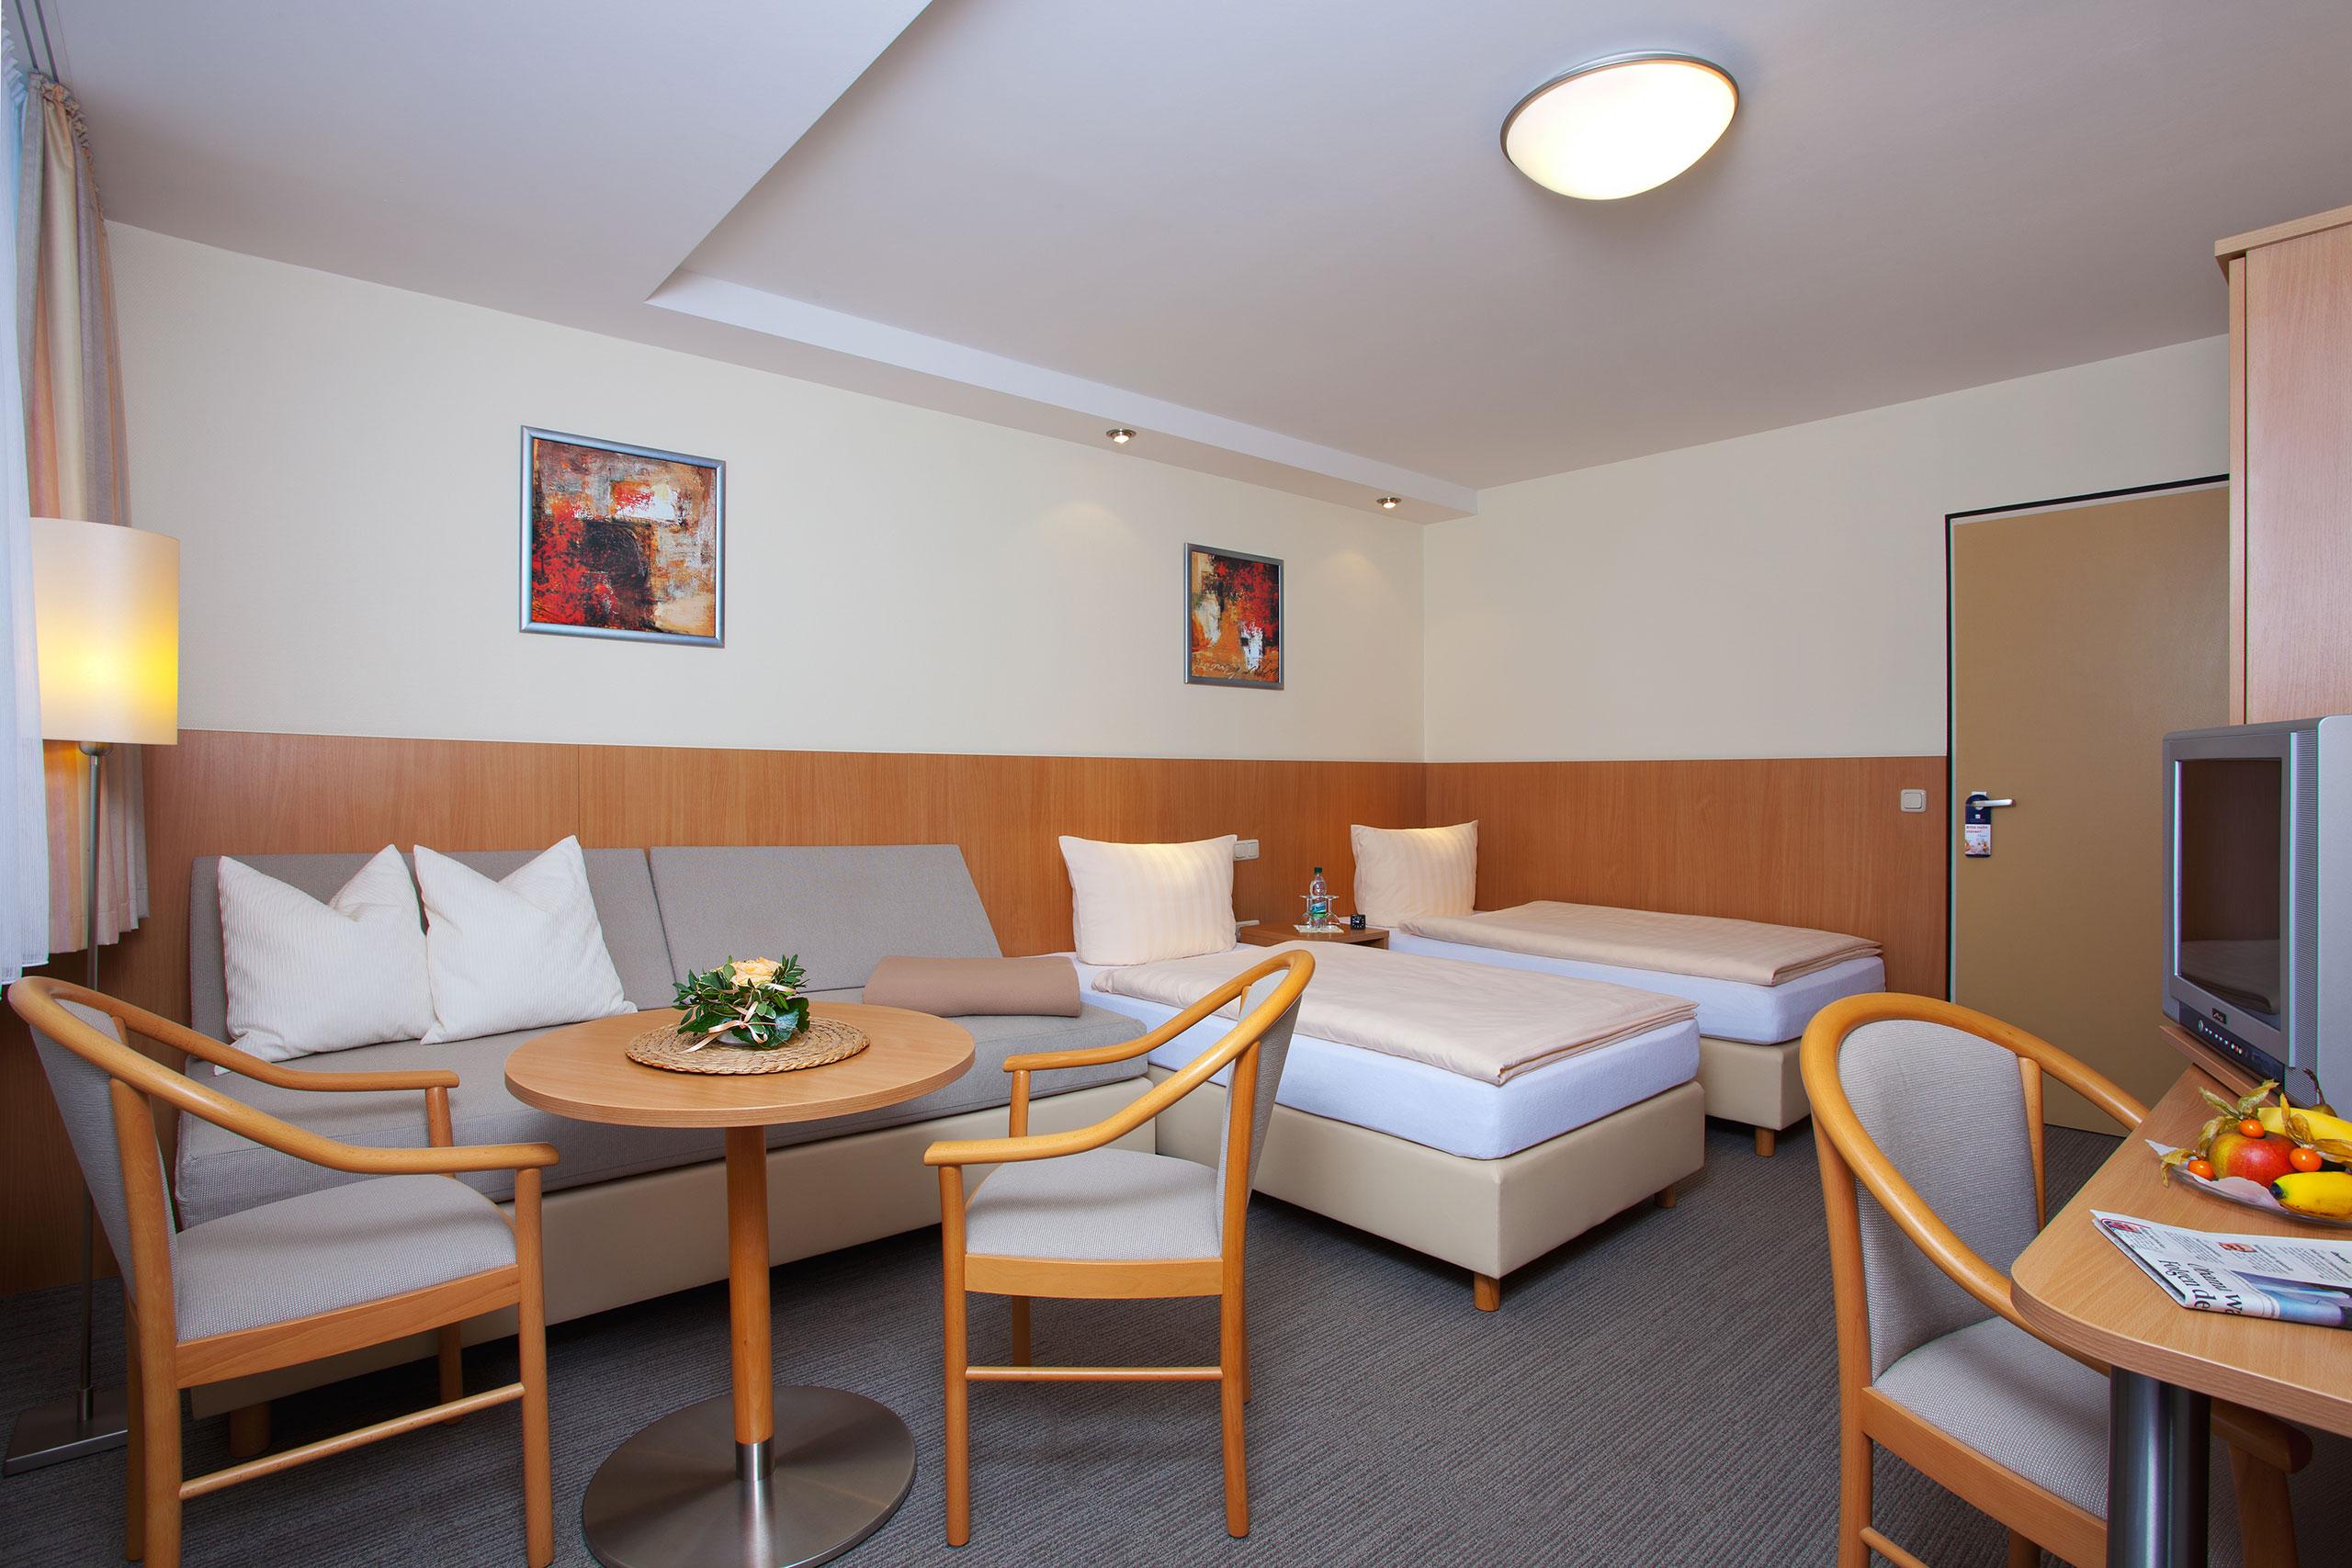 Doppelzimmer Hotel Haus Silberbach Selb Oberpfalz